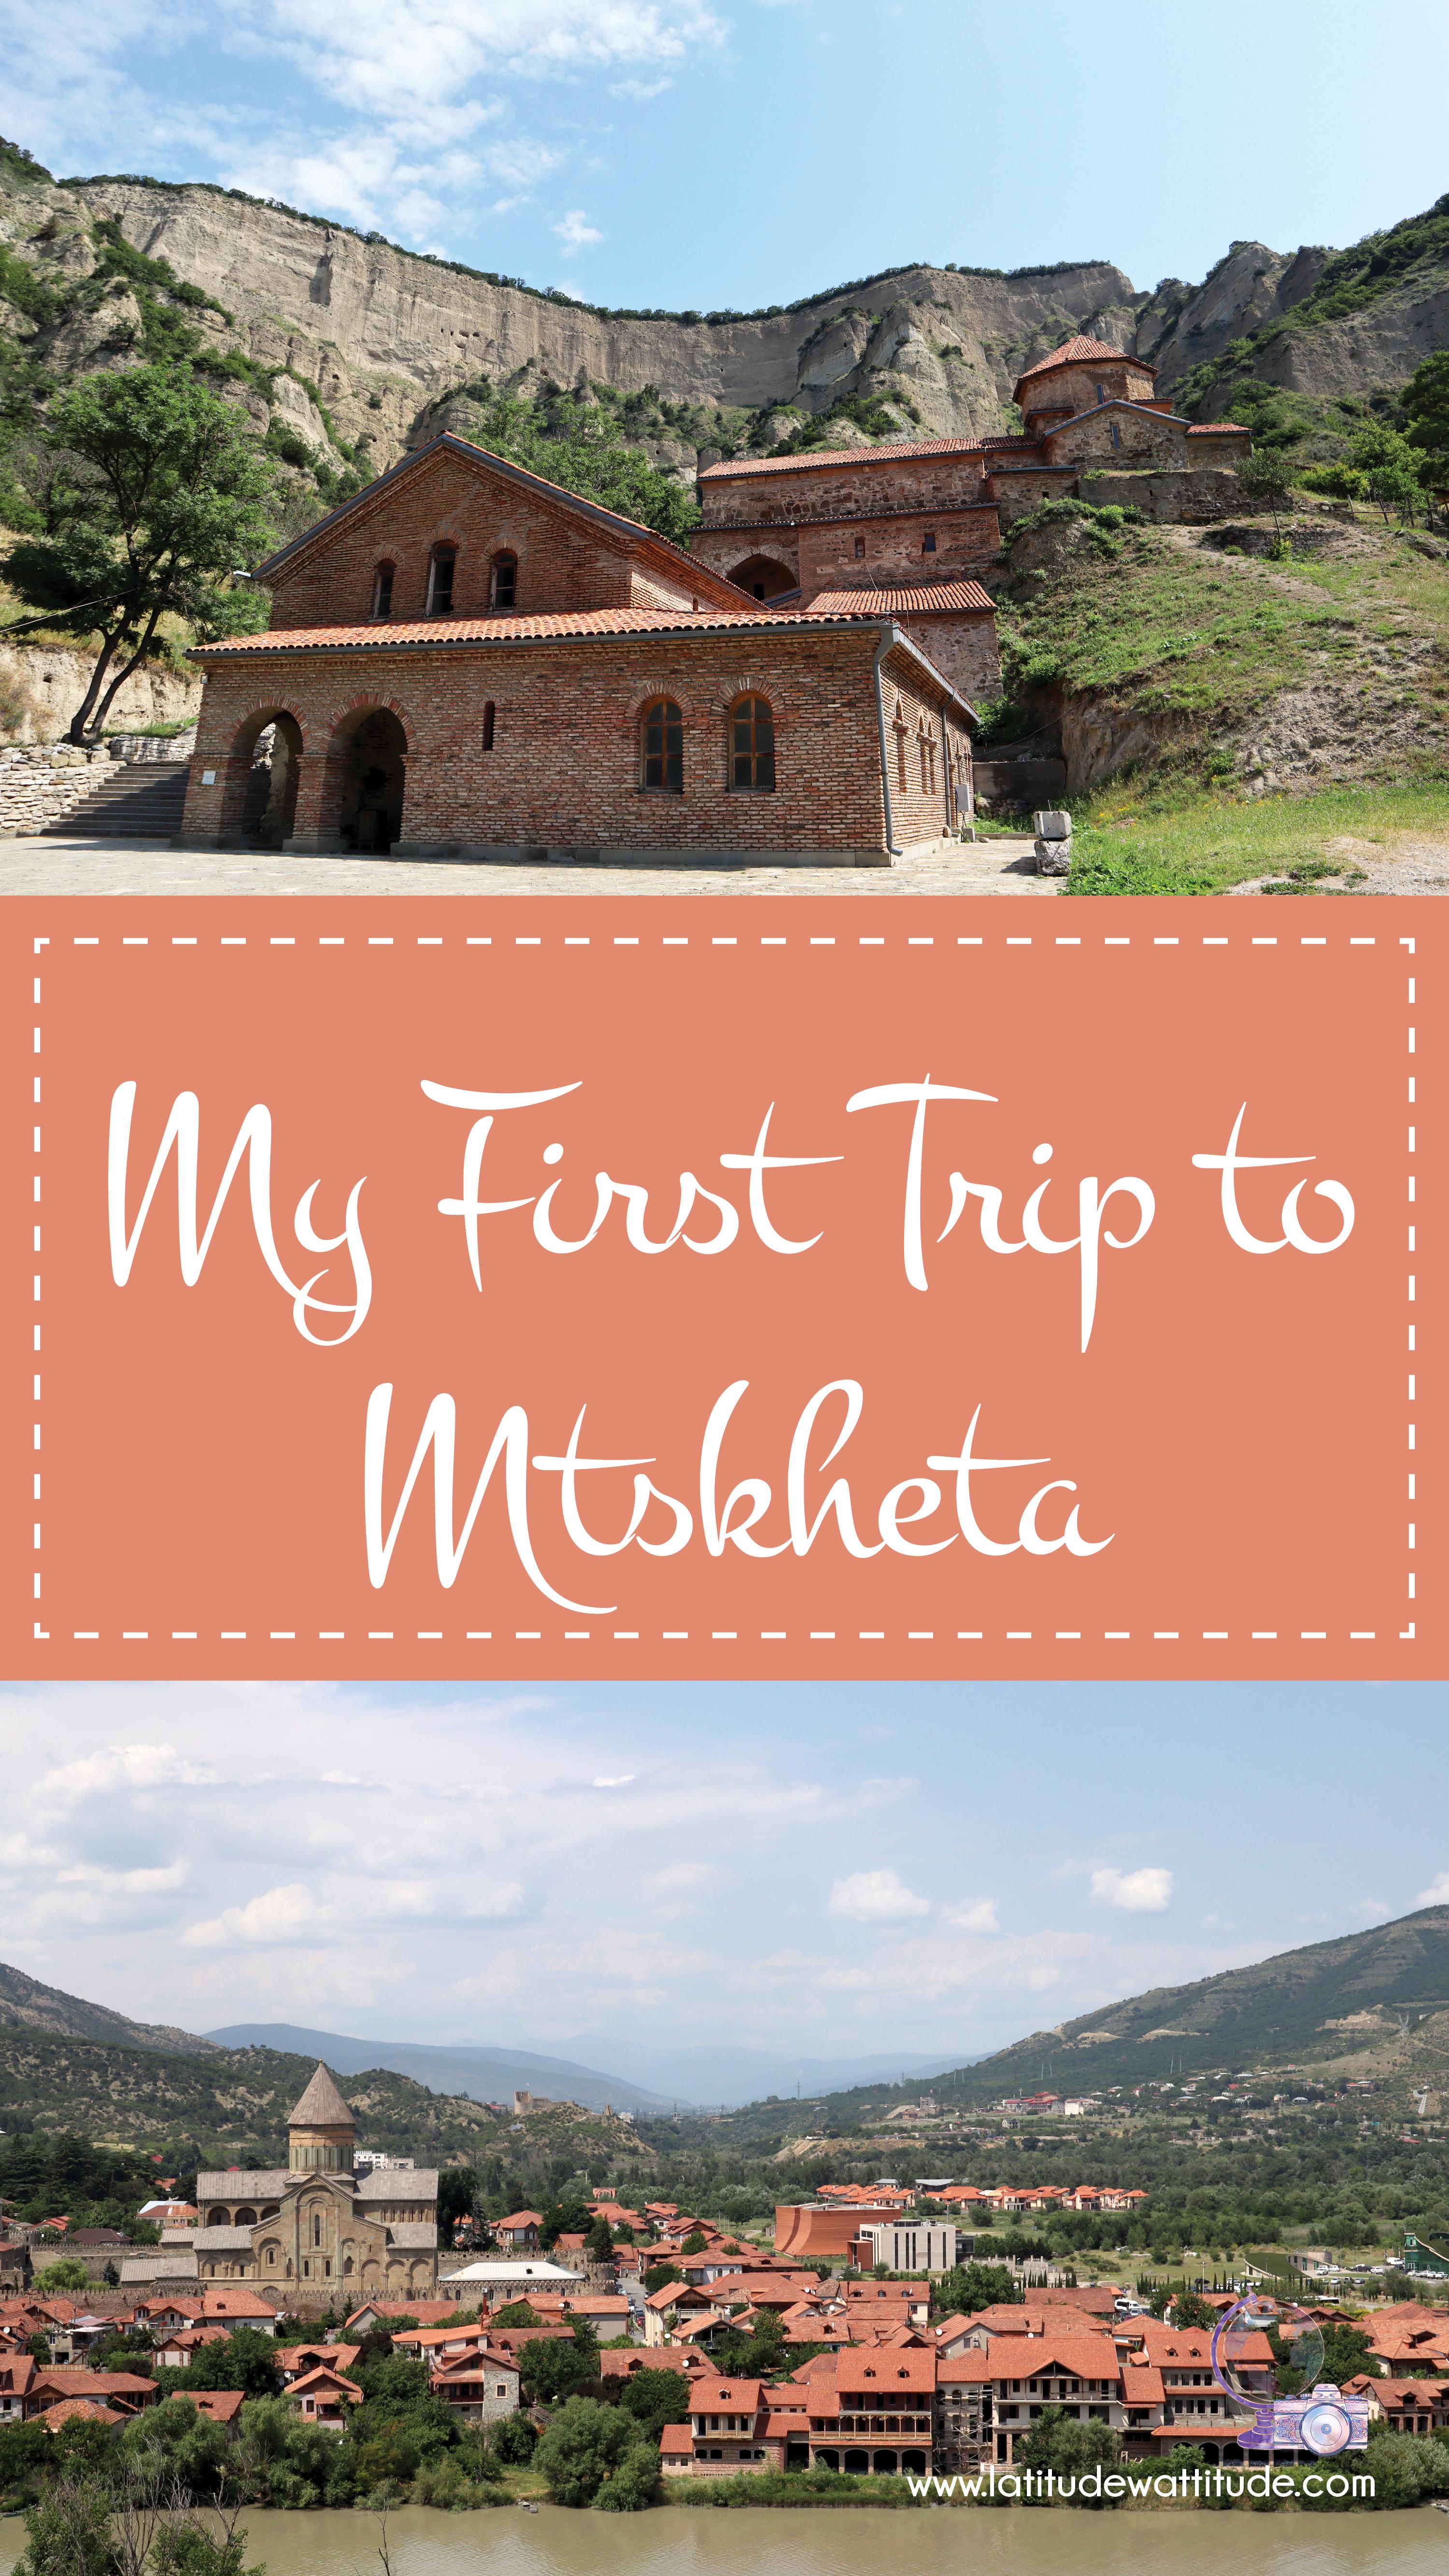 Mtskheta.png